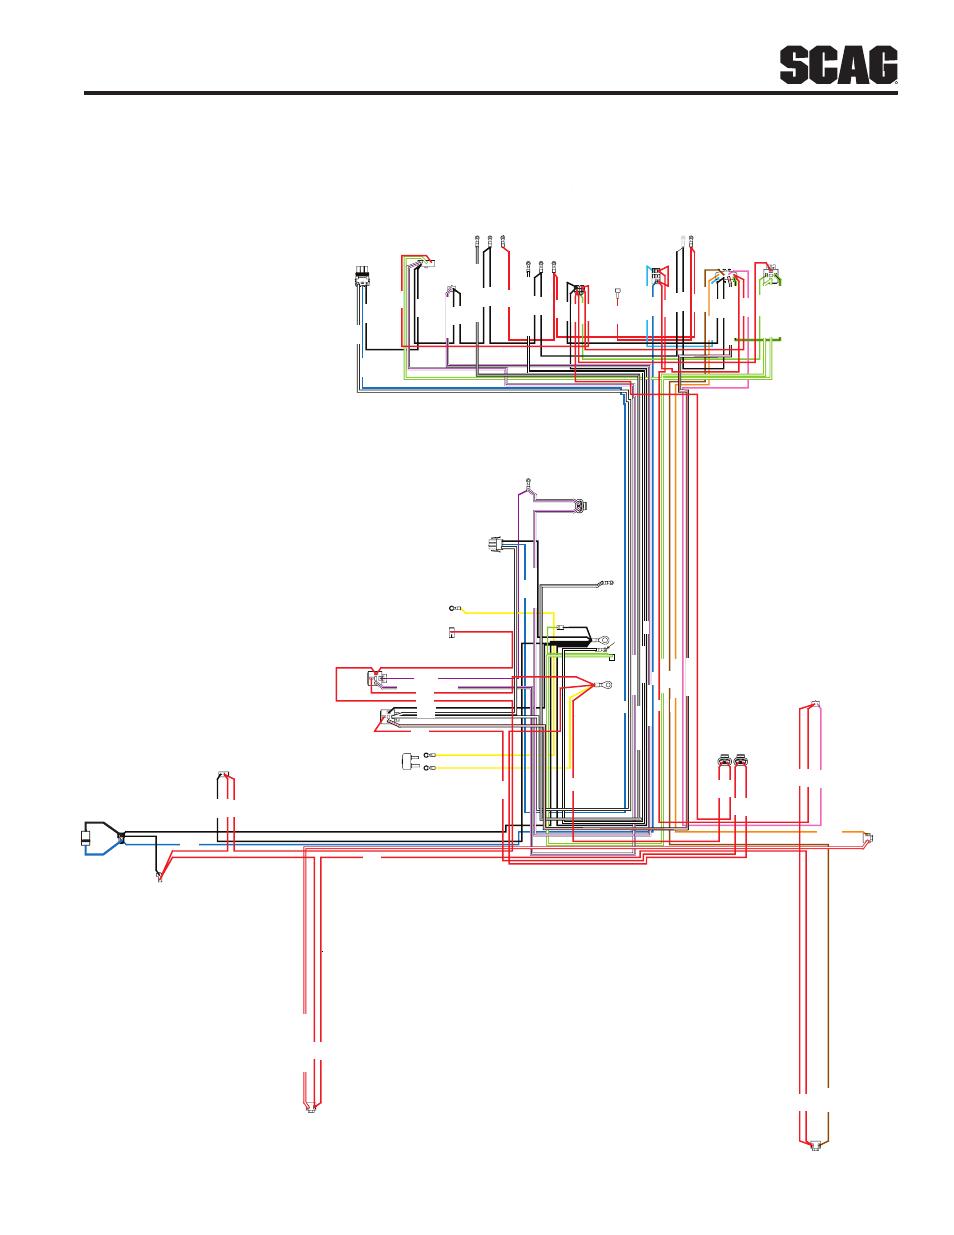 Superb Scag Electrical Wiring Diagram Echo Wiring Diagram Columbia Wiring Wiring 101 Archstreekradiomeanderfmnl